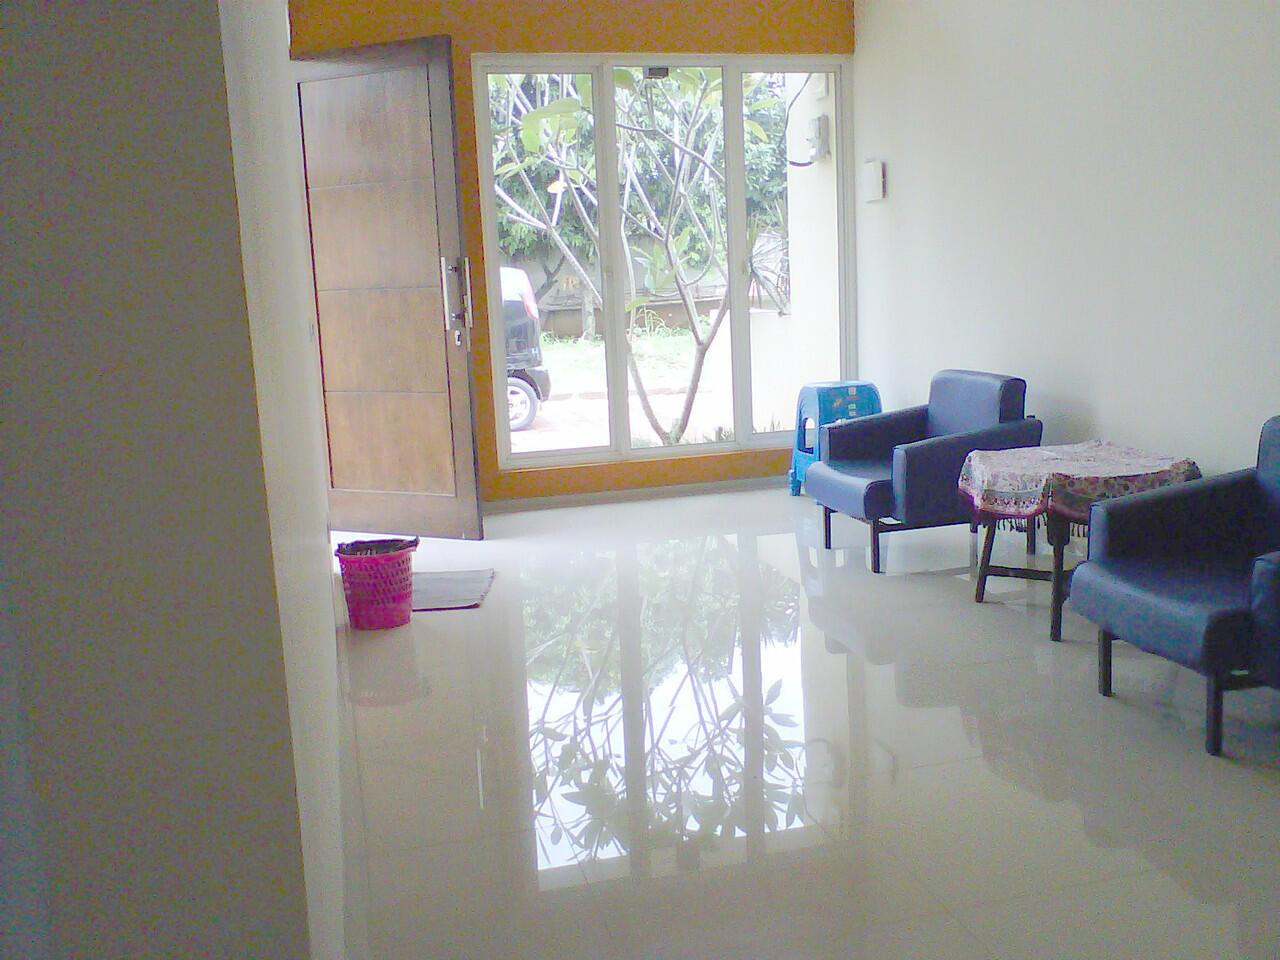 Rumah Townhouse di Sawah Lama 25 Menit Tol Bintaro Pdk Aren